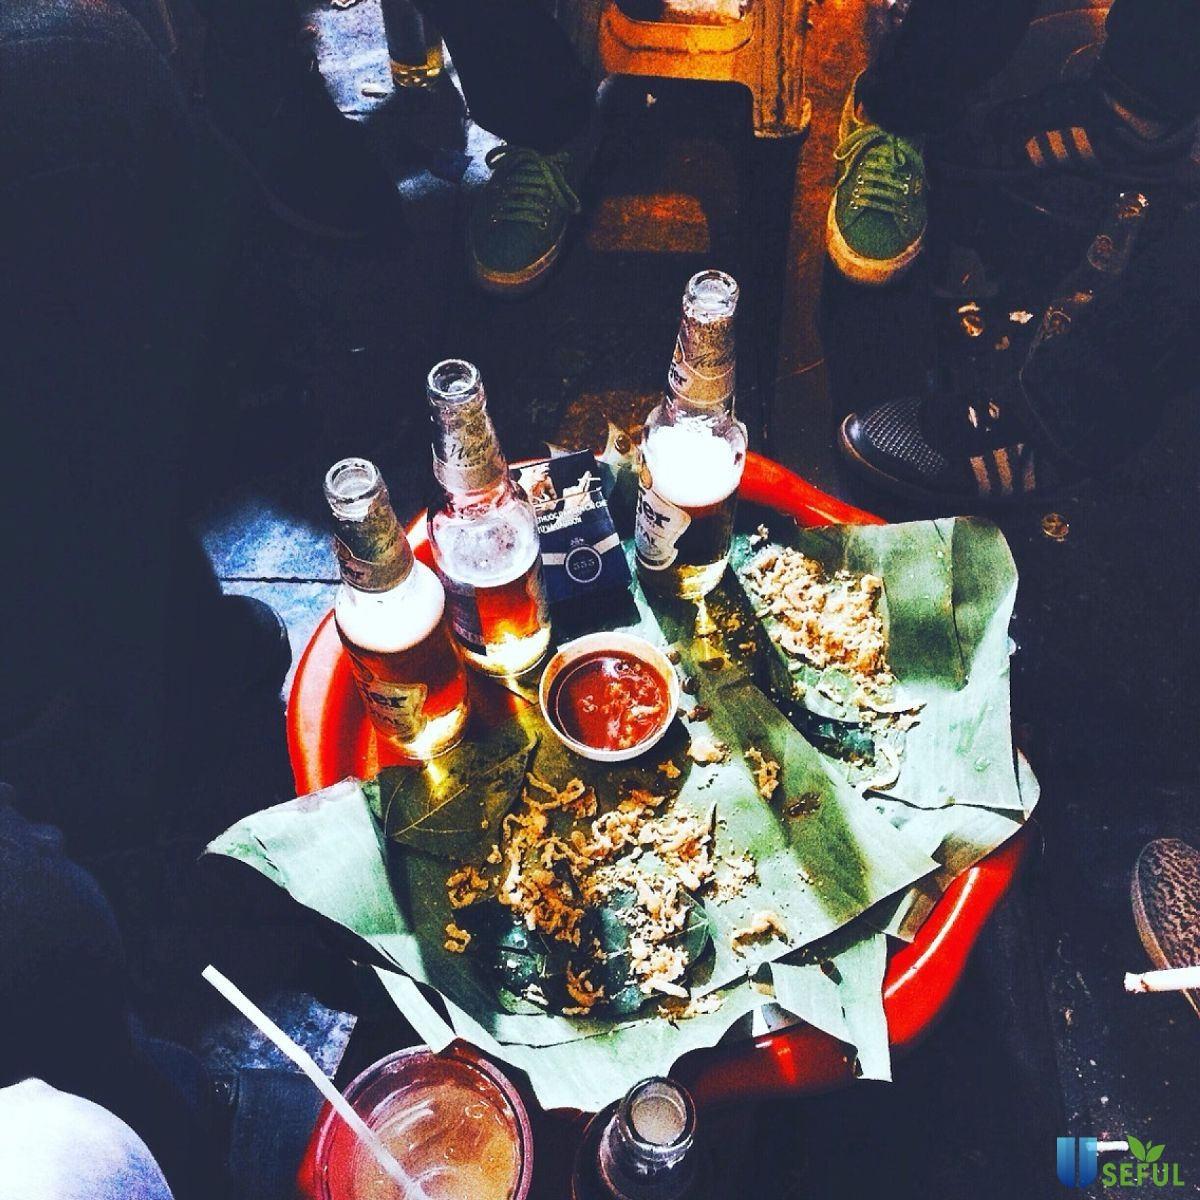 Bia cỏ Tạ Hiện